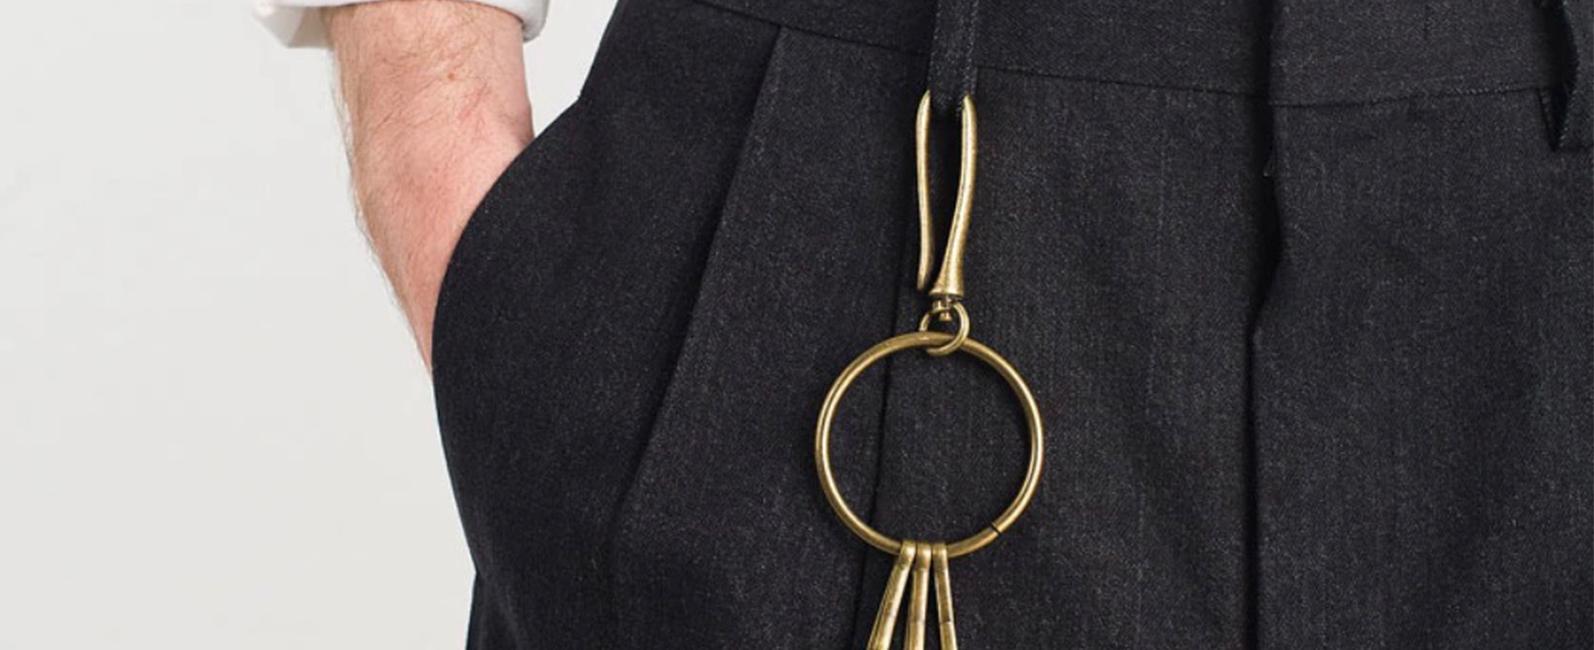 Men's Keyring / Keychain - Trending Now   VanityForbes